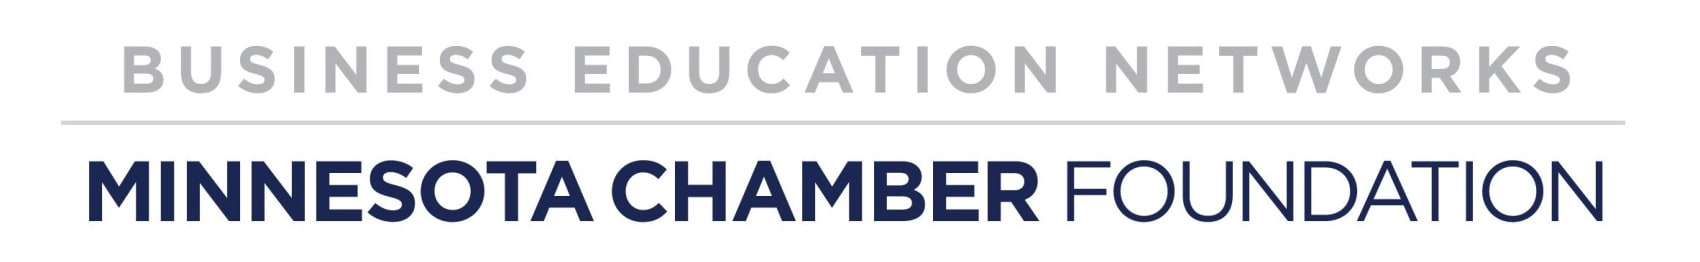 Logo---Business-Education-Networks-w1700.jpg